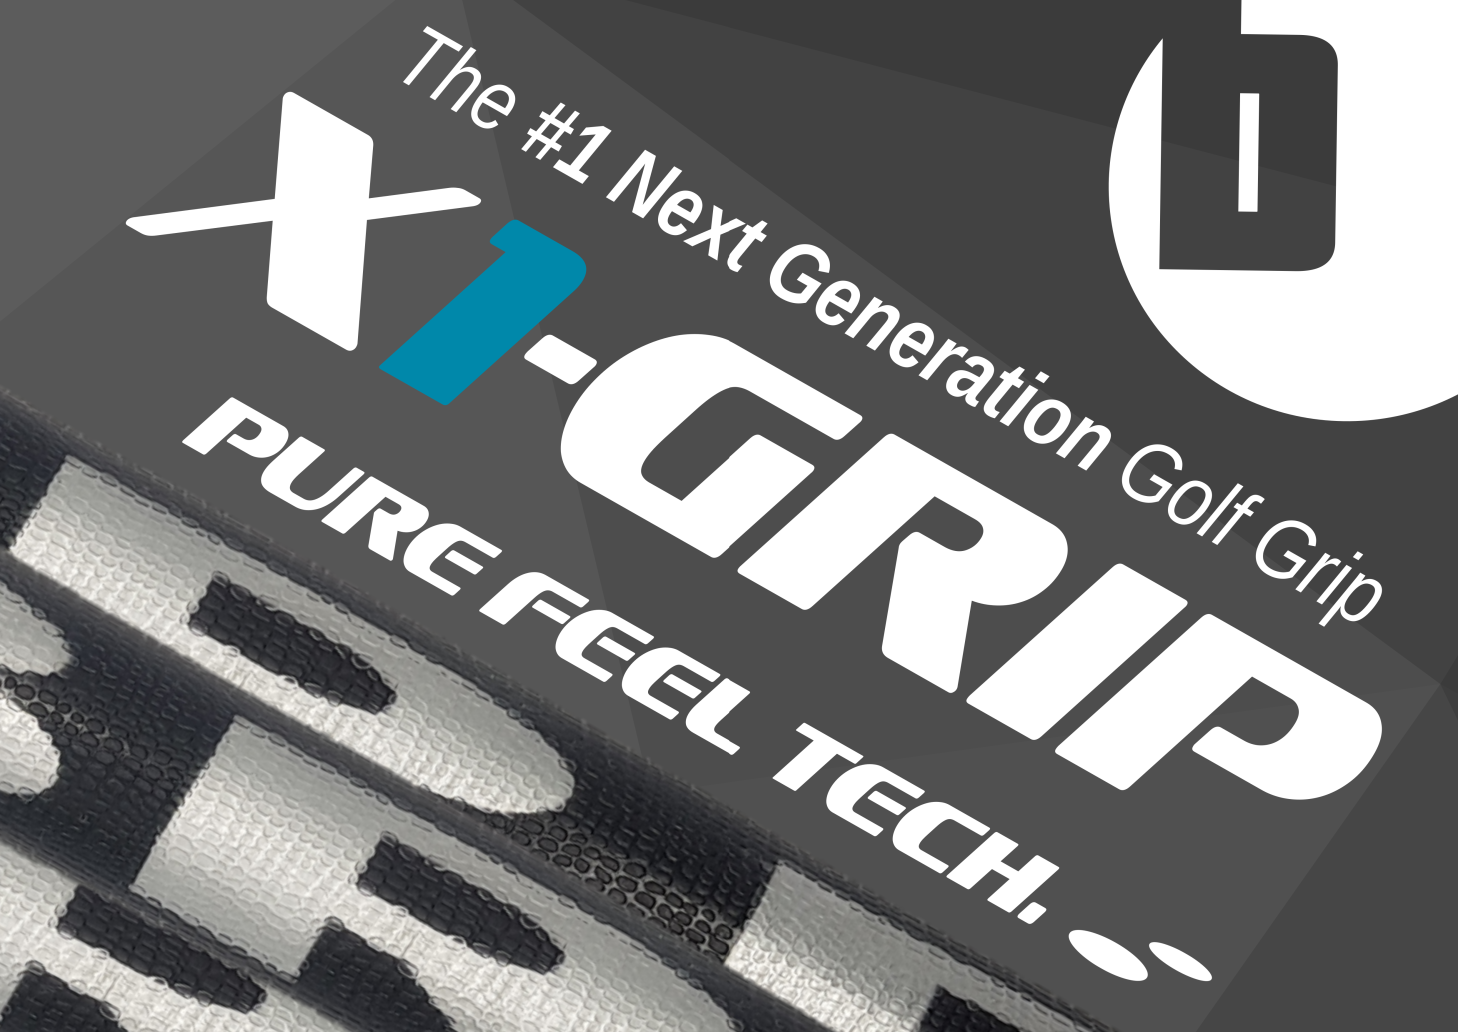 brd-x1-grips-the-no1-next-generation-golf-grip.png